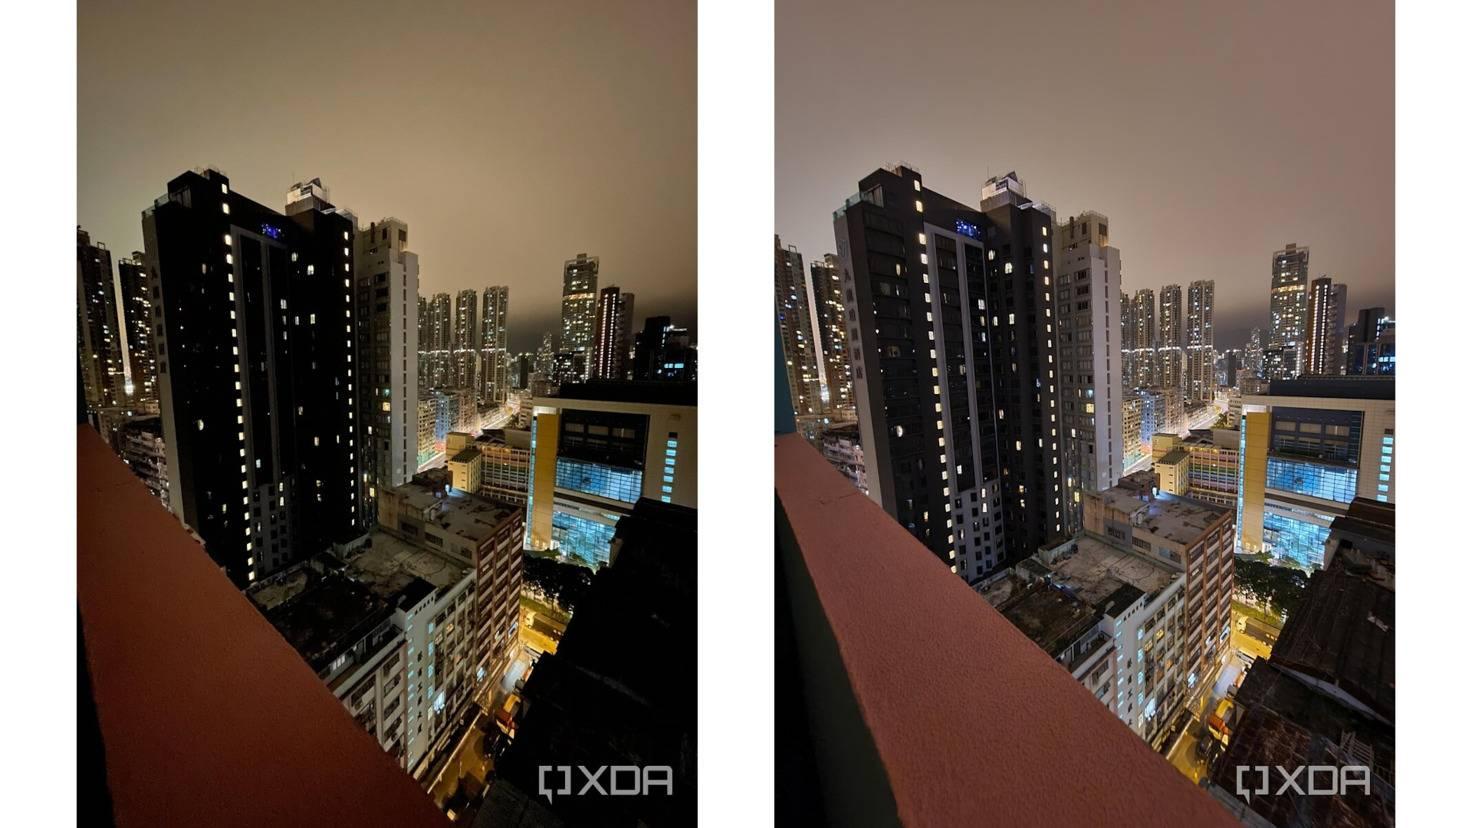 ultraweitwinkel-iphone-12-pro-max-vs-galaxy-note-20-ultra